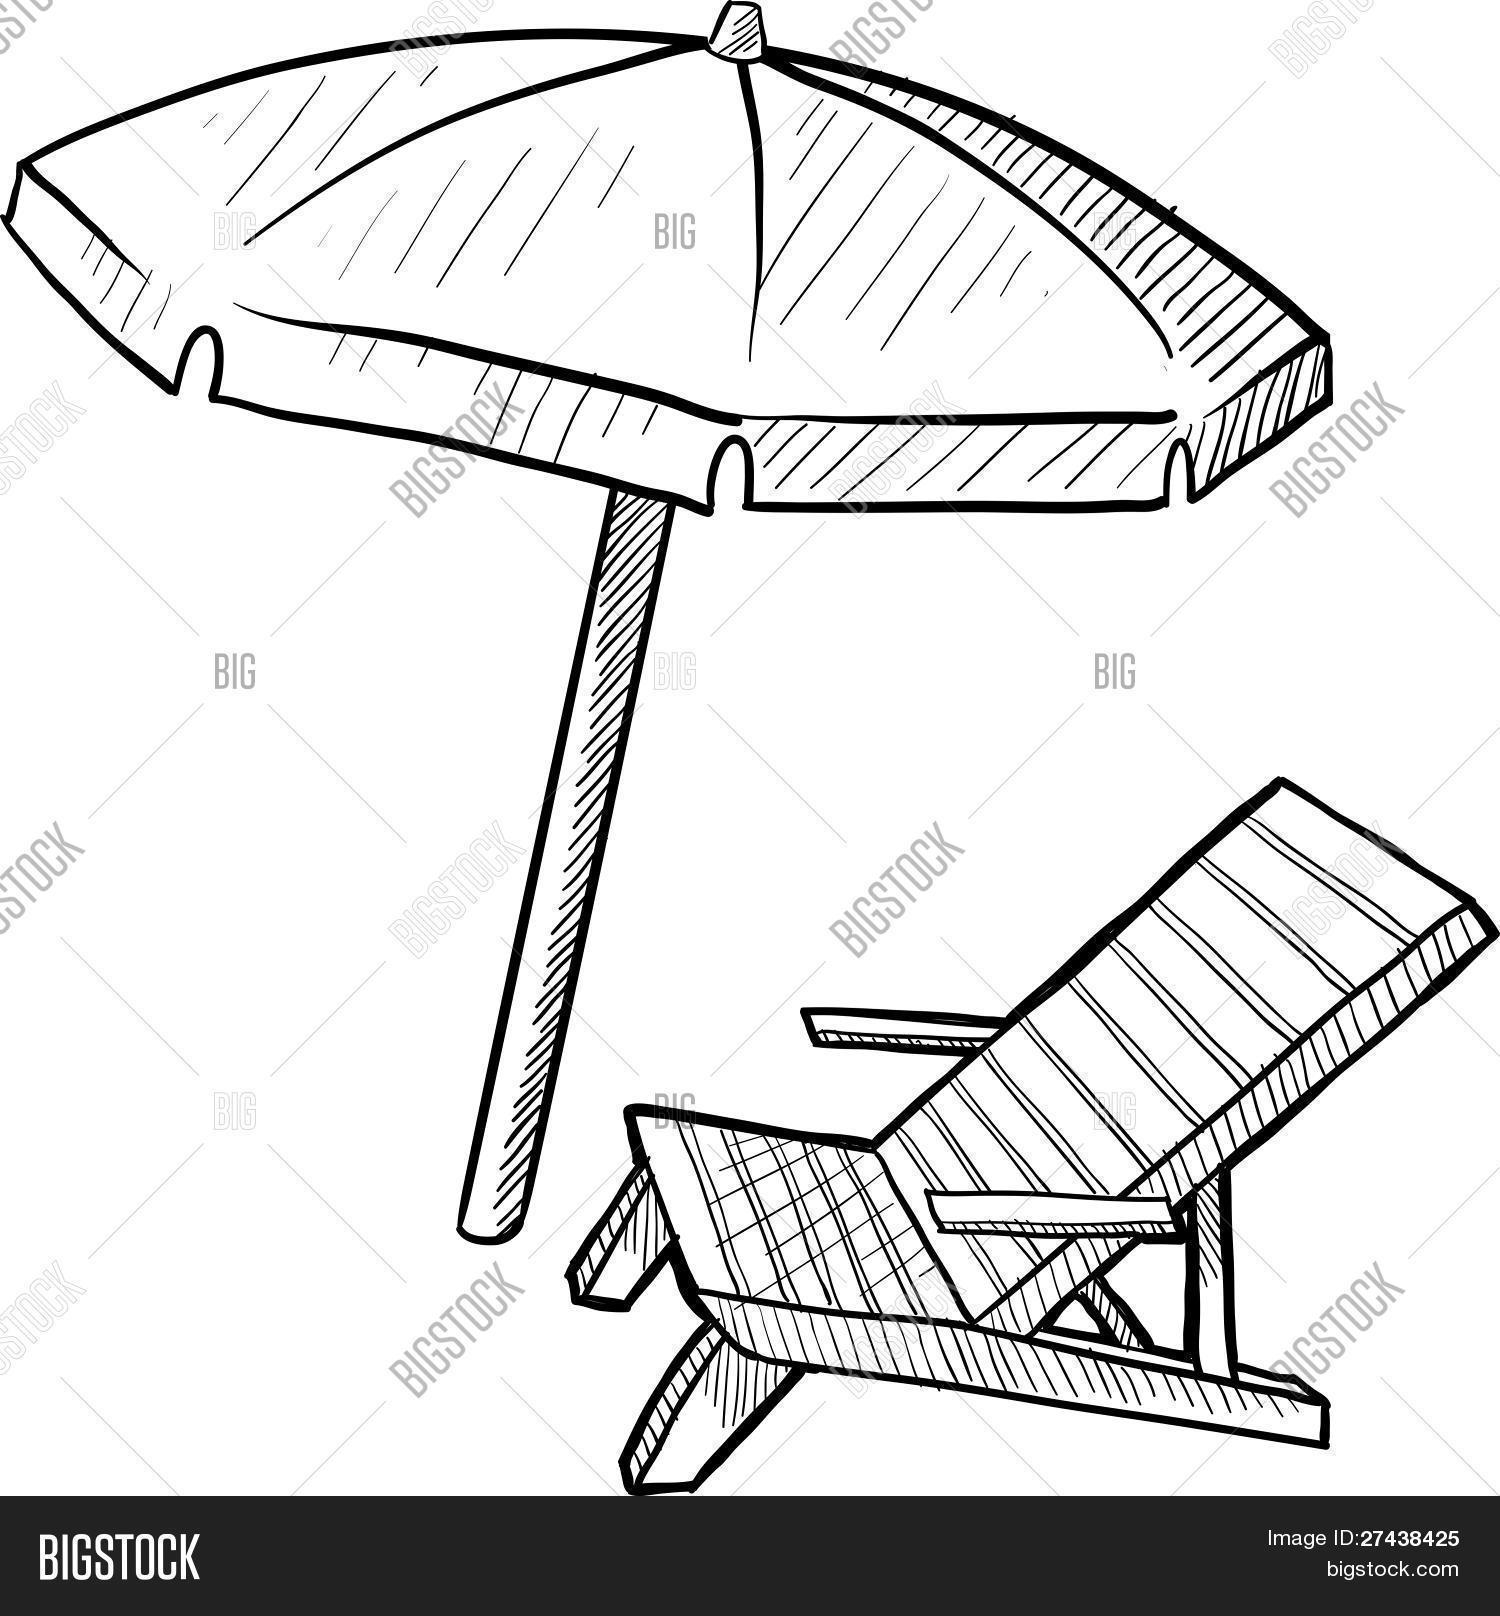 Beach chair umbrella vector photo free trial bigstock beach chair and umbrella sketch altavistaventures Images